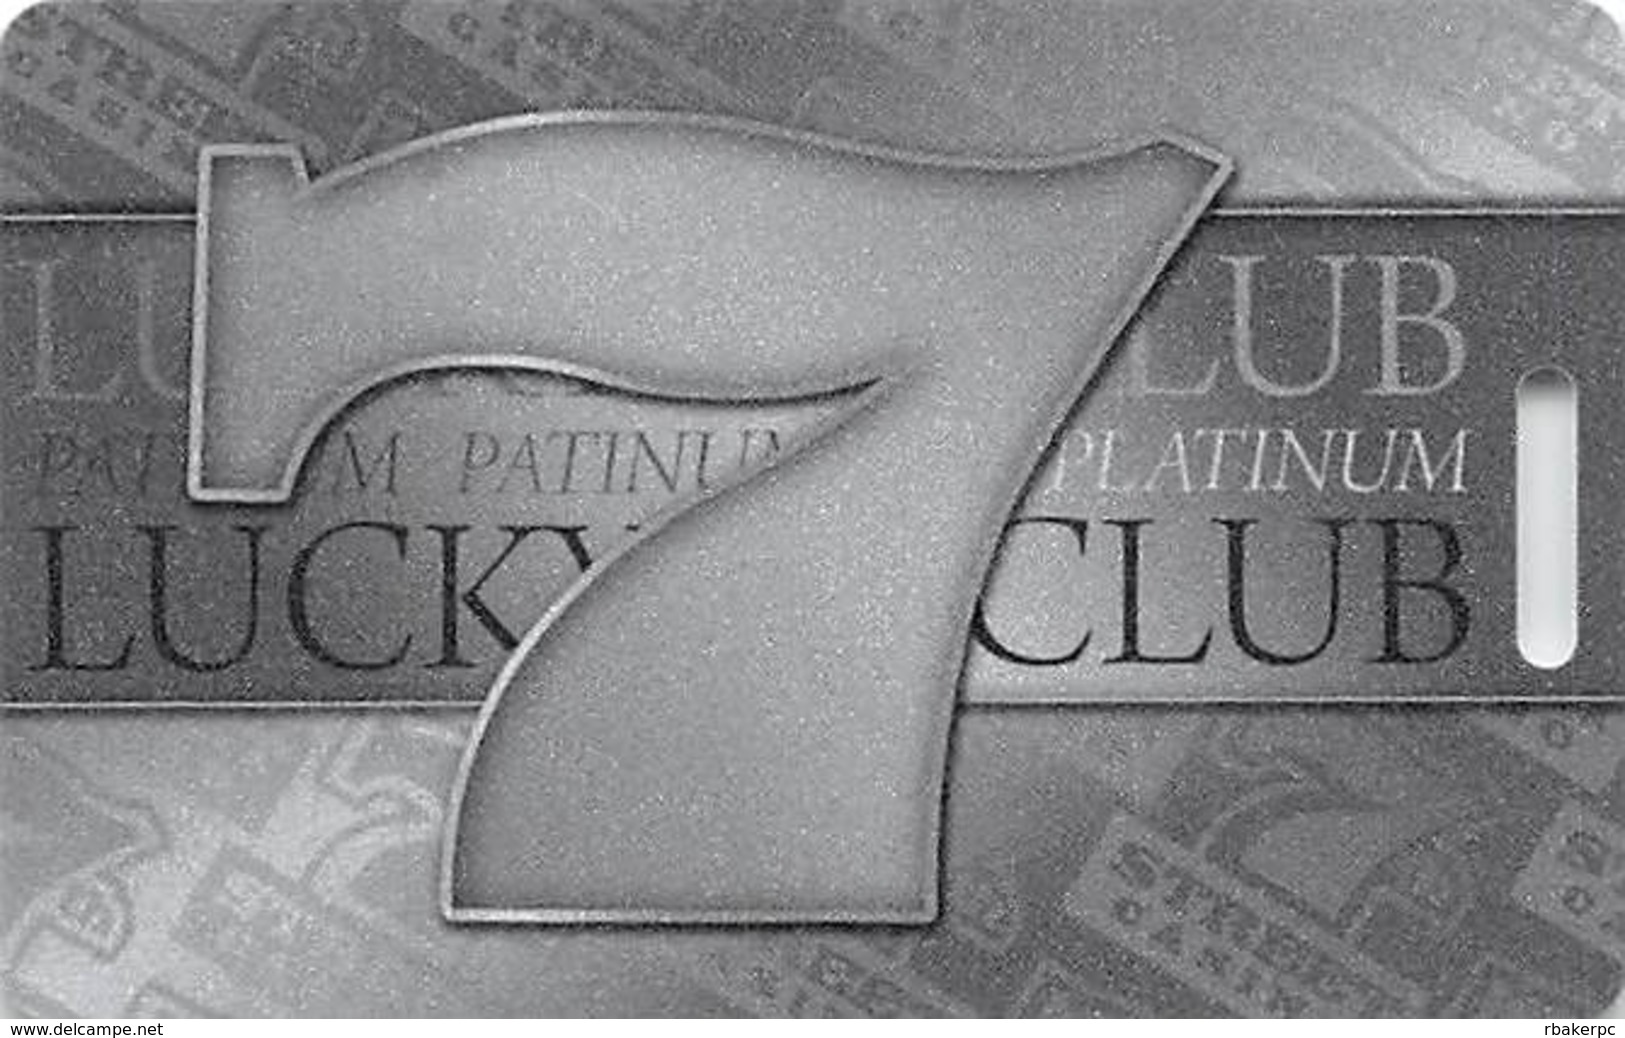 7th Street Casino - Kansas City, KS - BLANK Slot Card - PG Mfg Mark - Casino Cards